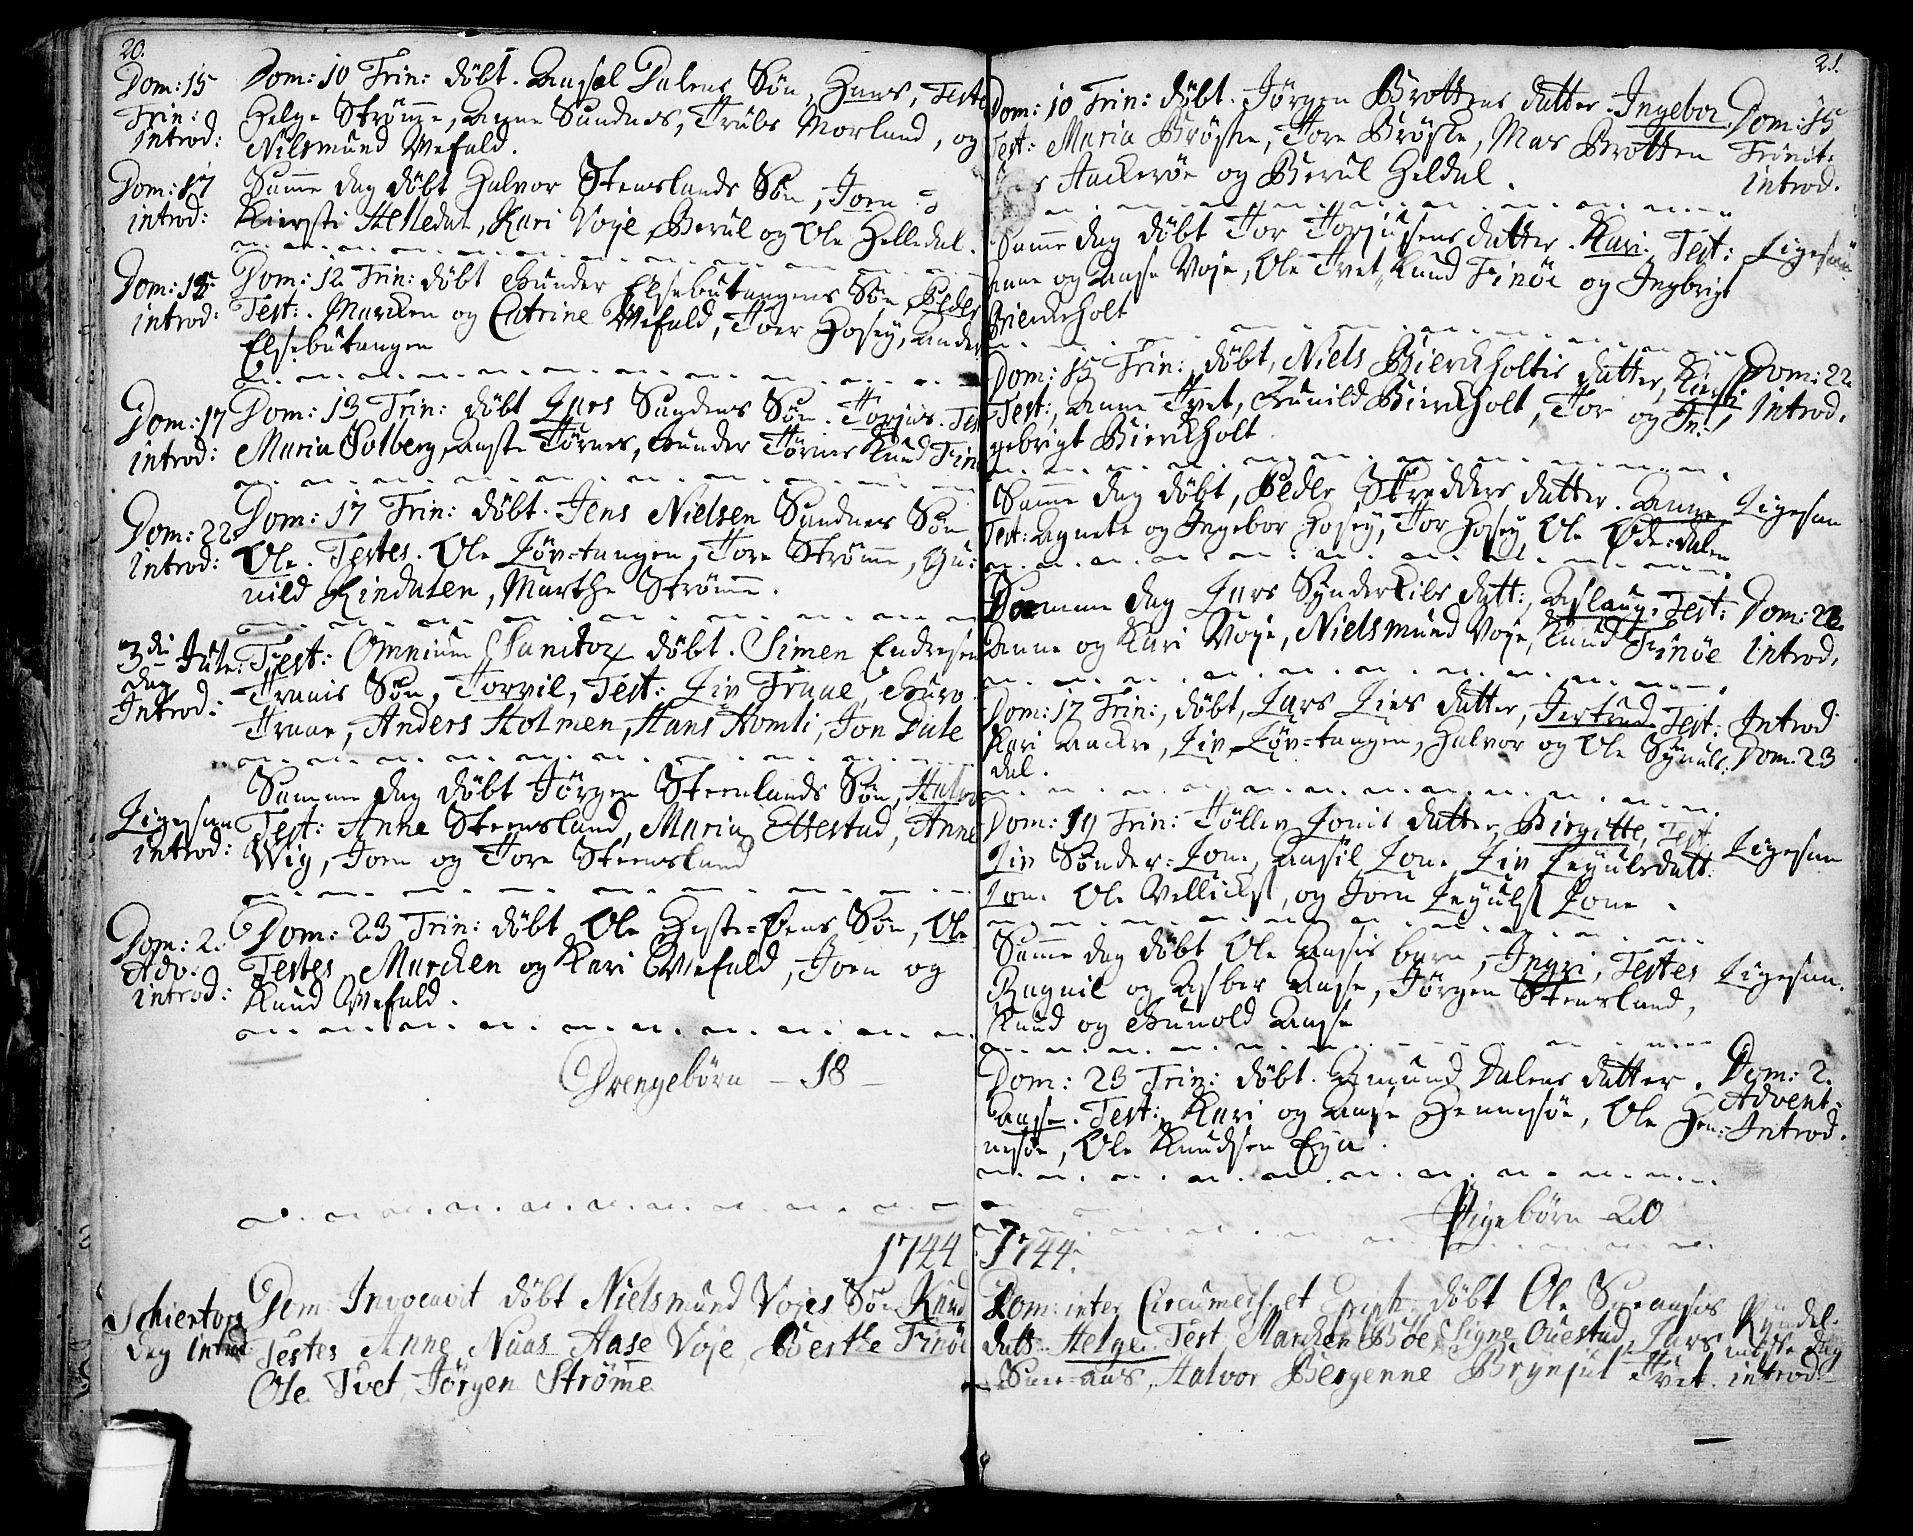 SAKO, Drangedal kirkebøker, F/Fa/L0001: Ministerialbok nr. 1, 1697-1767, s. 20-21